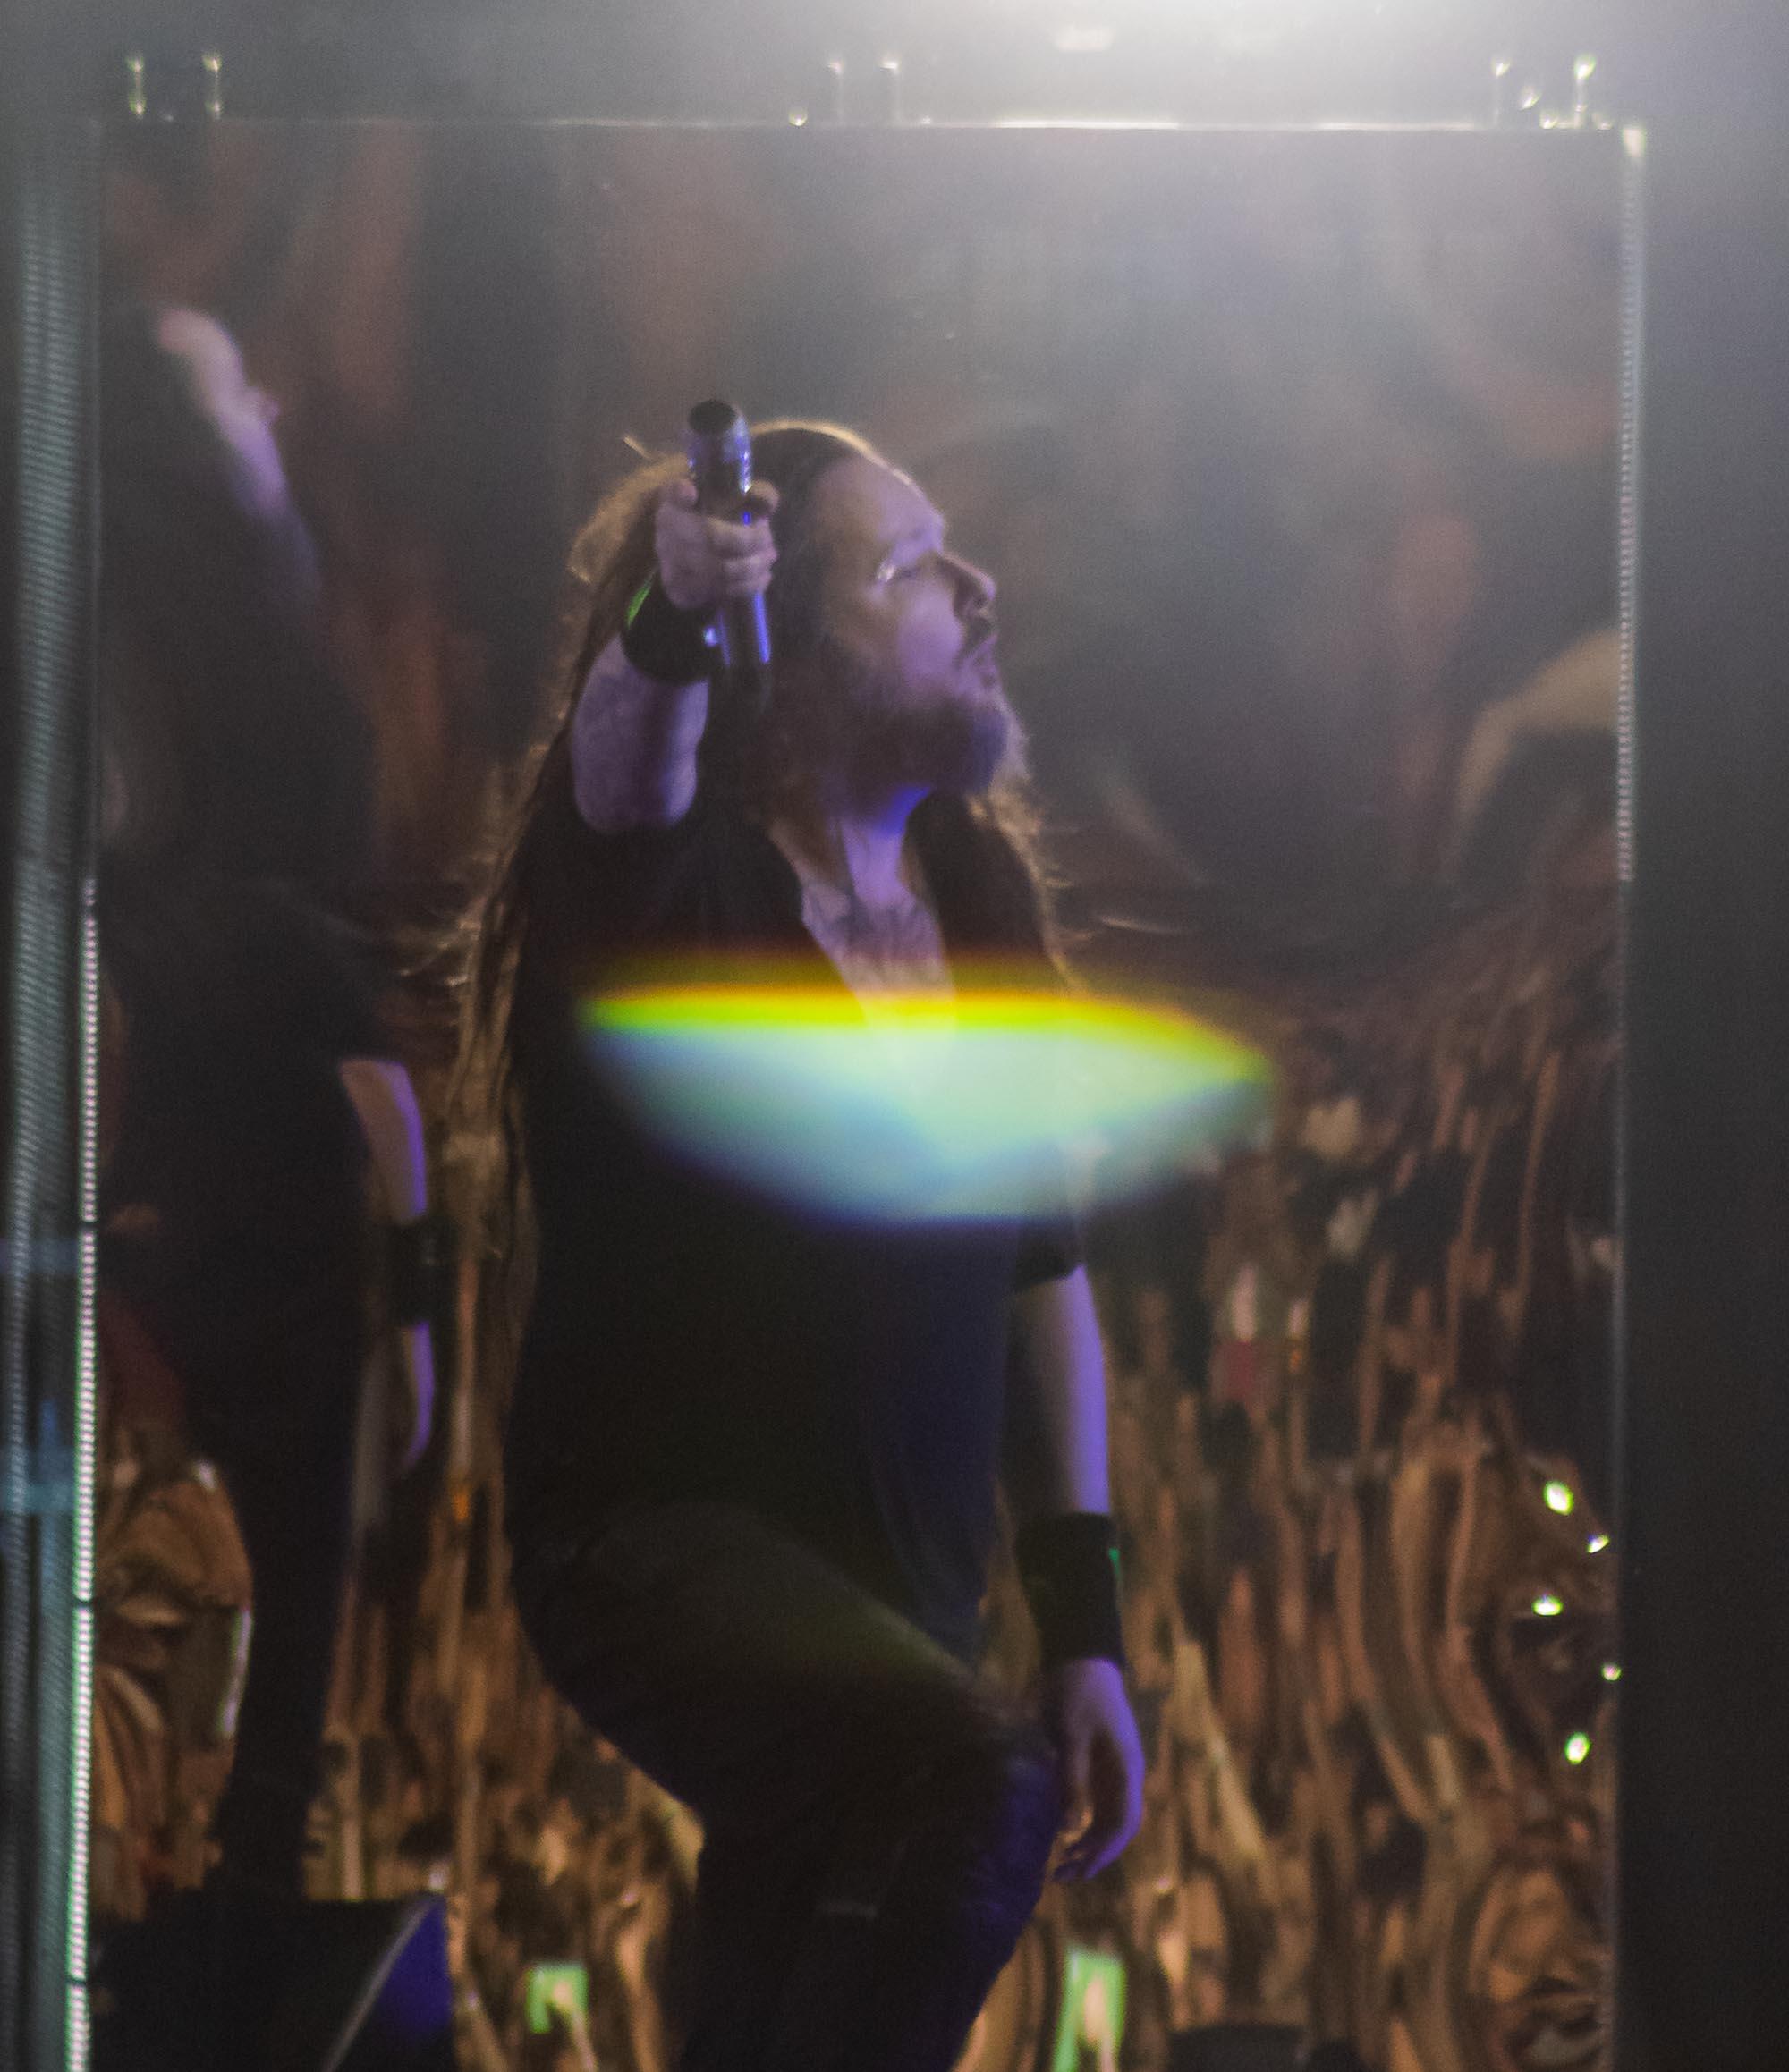 Korn-BudweiserStage-Toronto_Ontario-20190814-JeremyGretzinger20